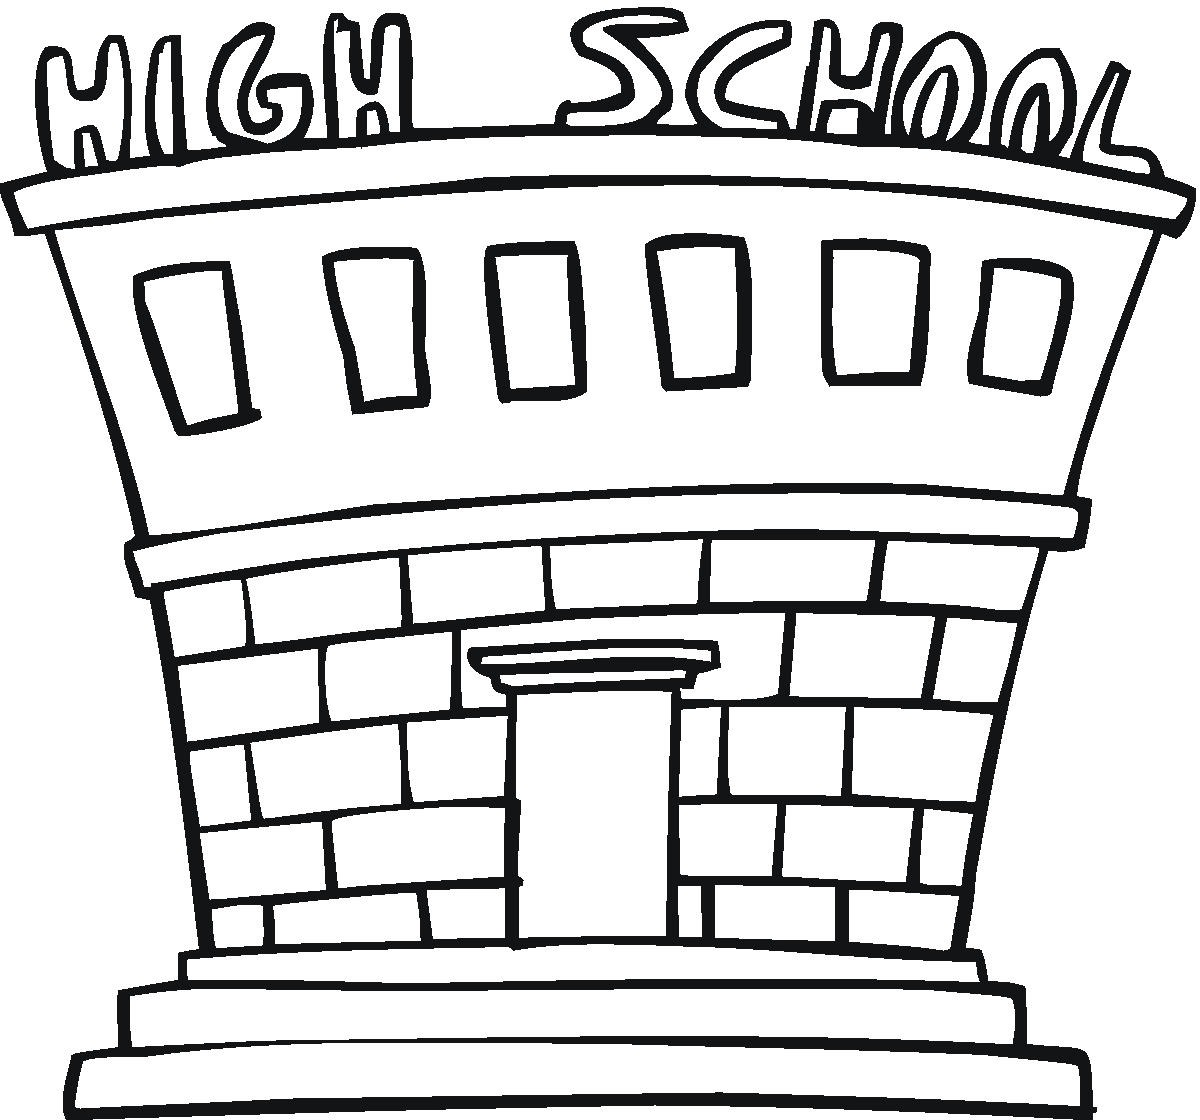 Jesus Goes to High School